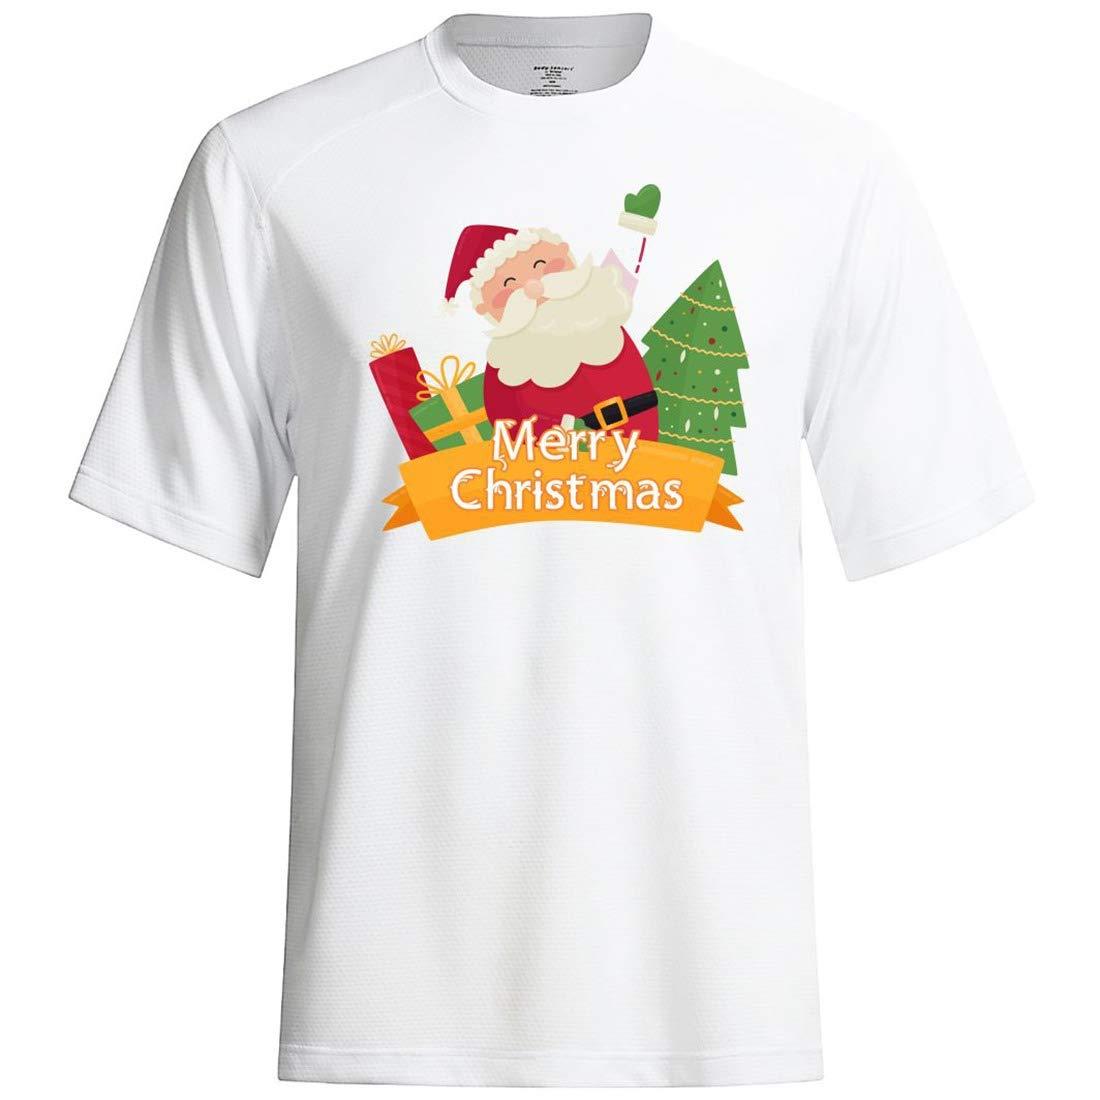 af2176161 Amazon.com: Custom Dye Sublimation t Shirt 4 Color Print White: Clothing